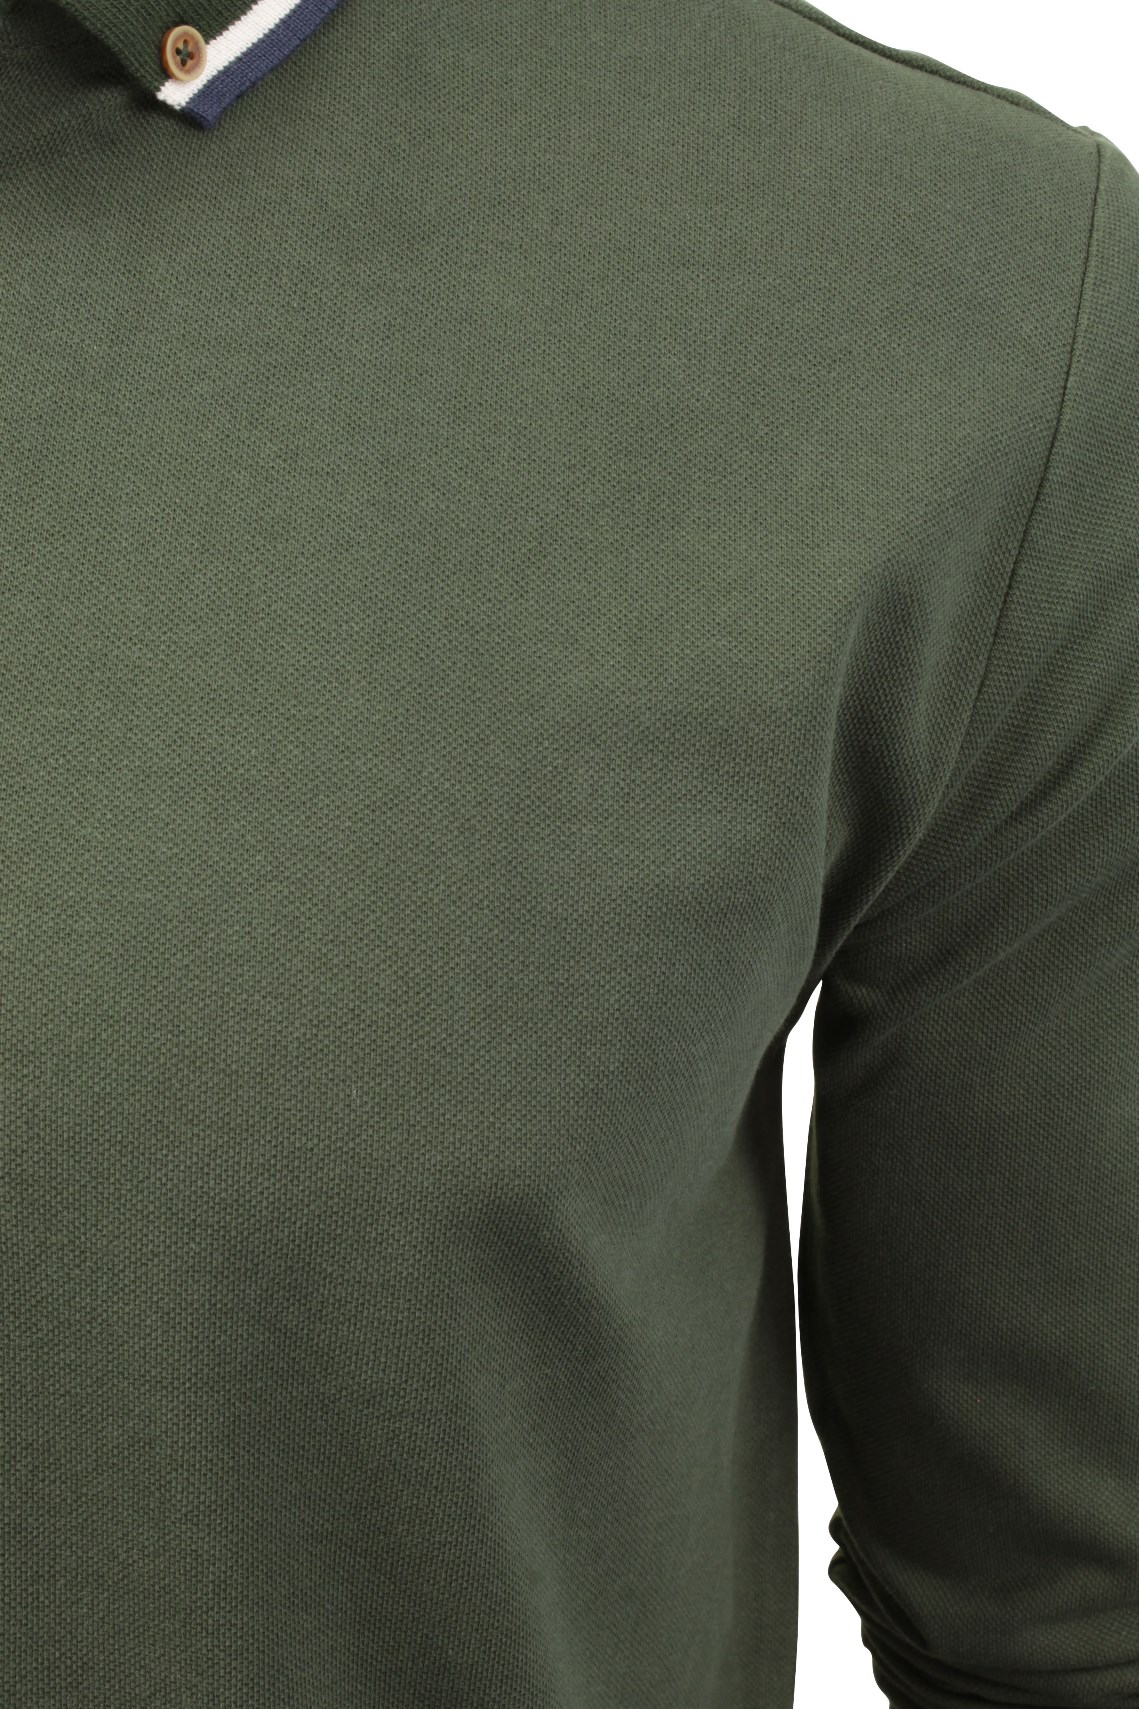 MEN POLO SHIRTS ALL SEASON COLLARED T-SHIRTS TEES LYLE CHRISTMAS GIFT RRP £65